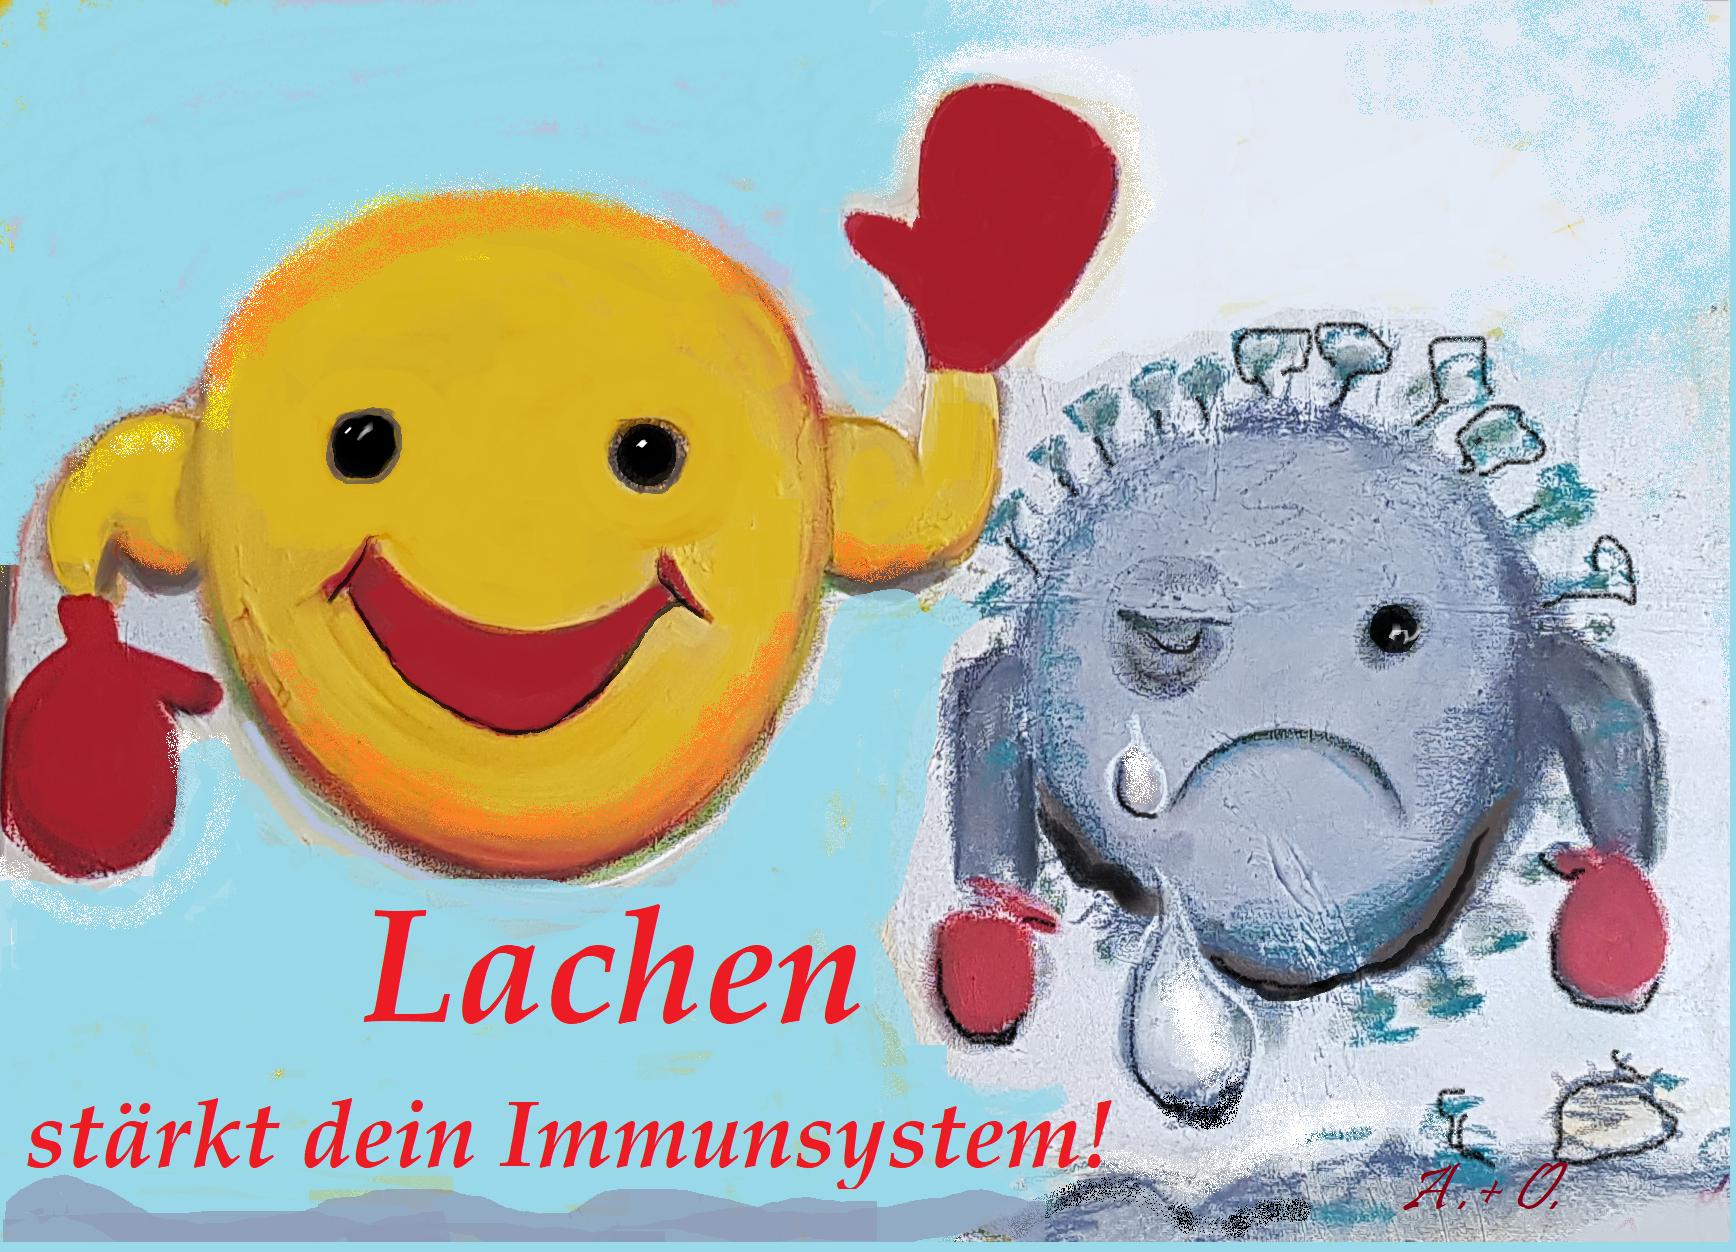 Lachen stärkt dein Immunsystem